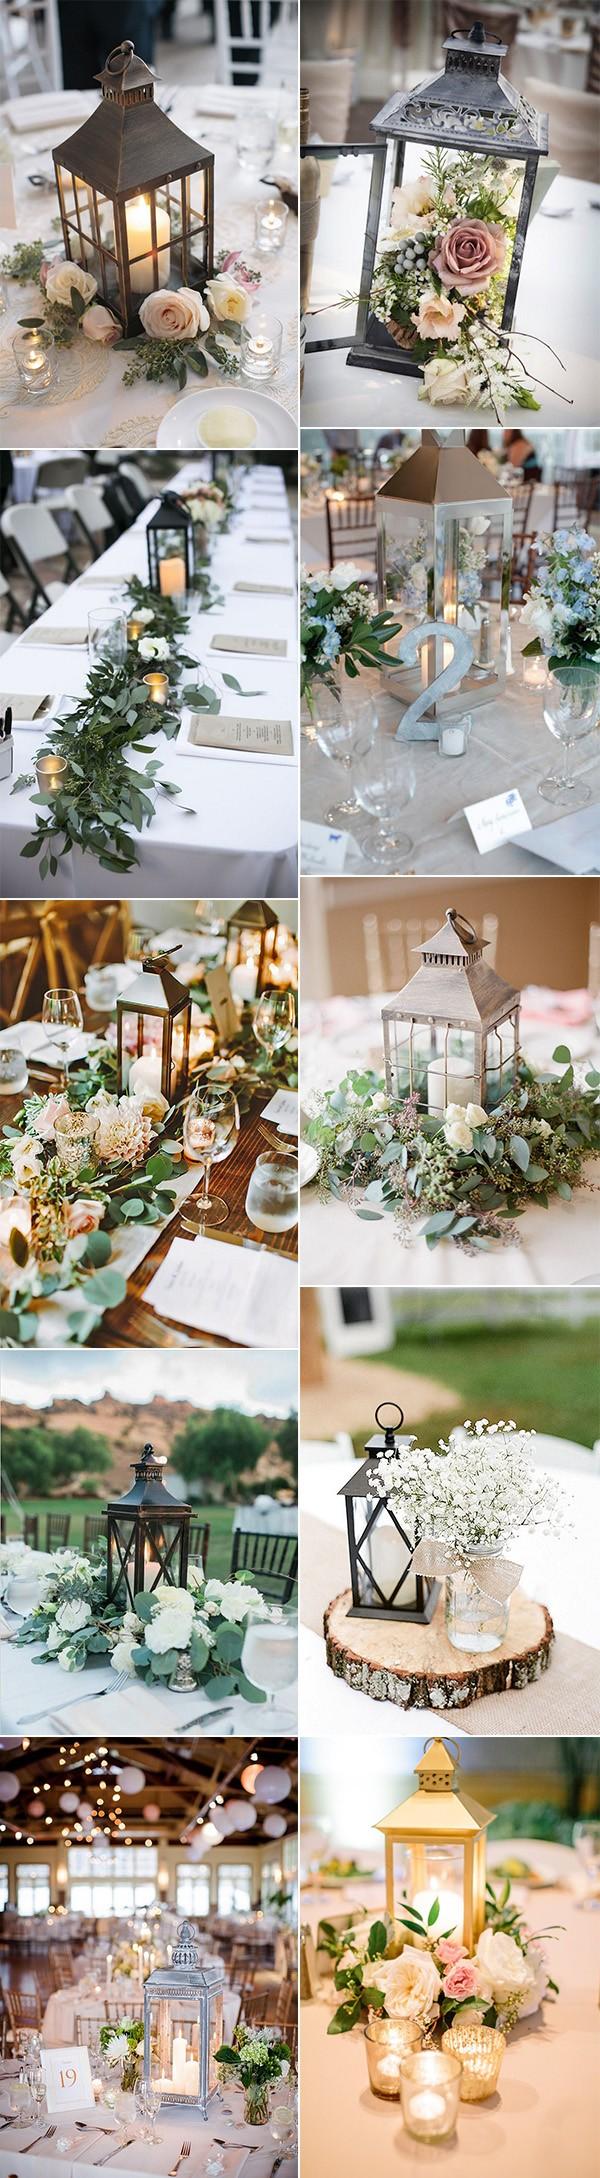 amazing creative lantern wedding centerpieces